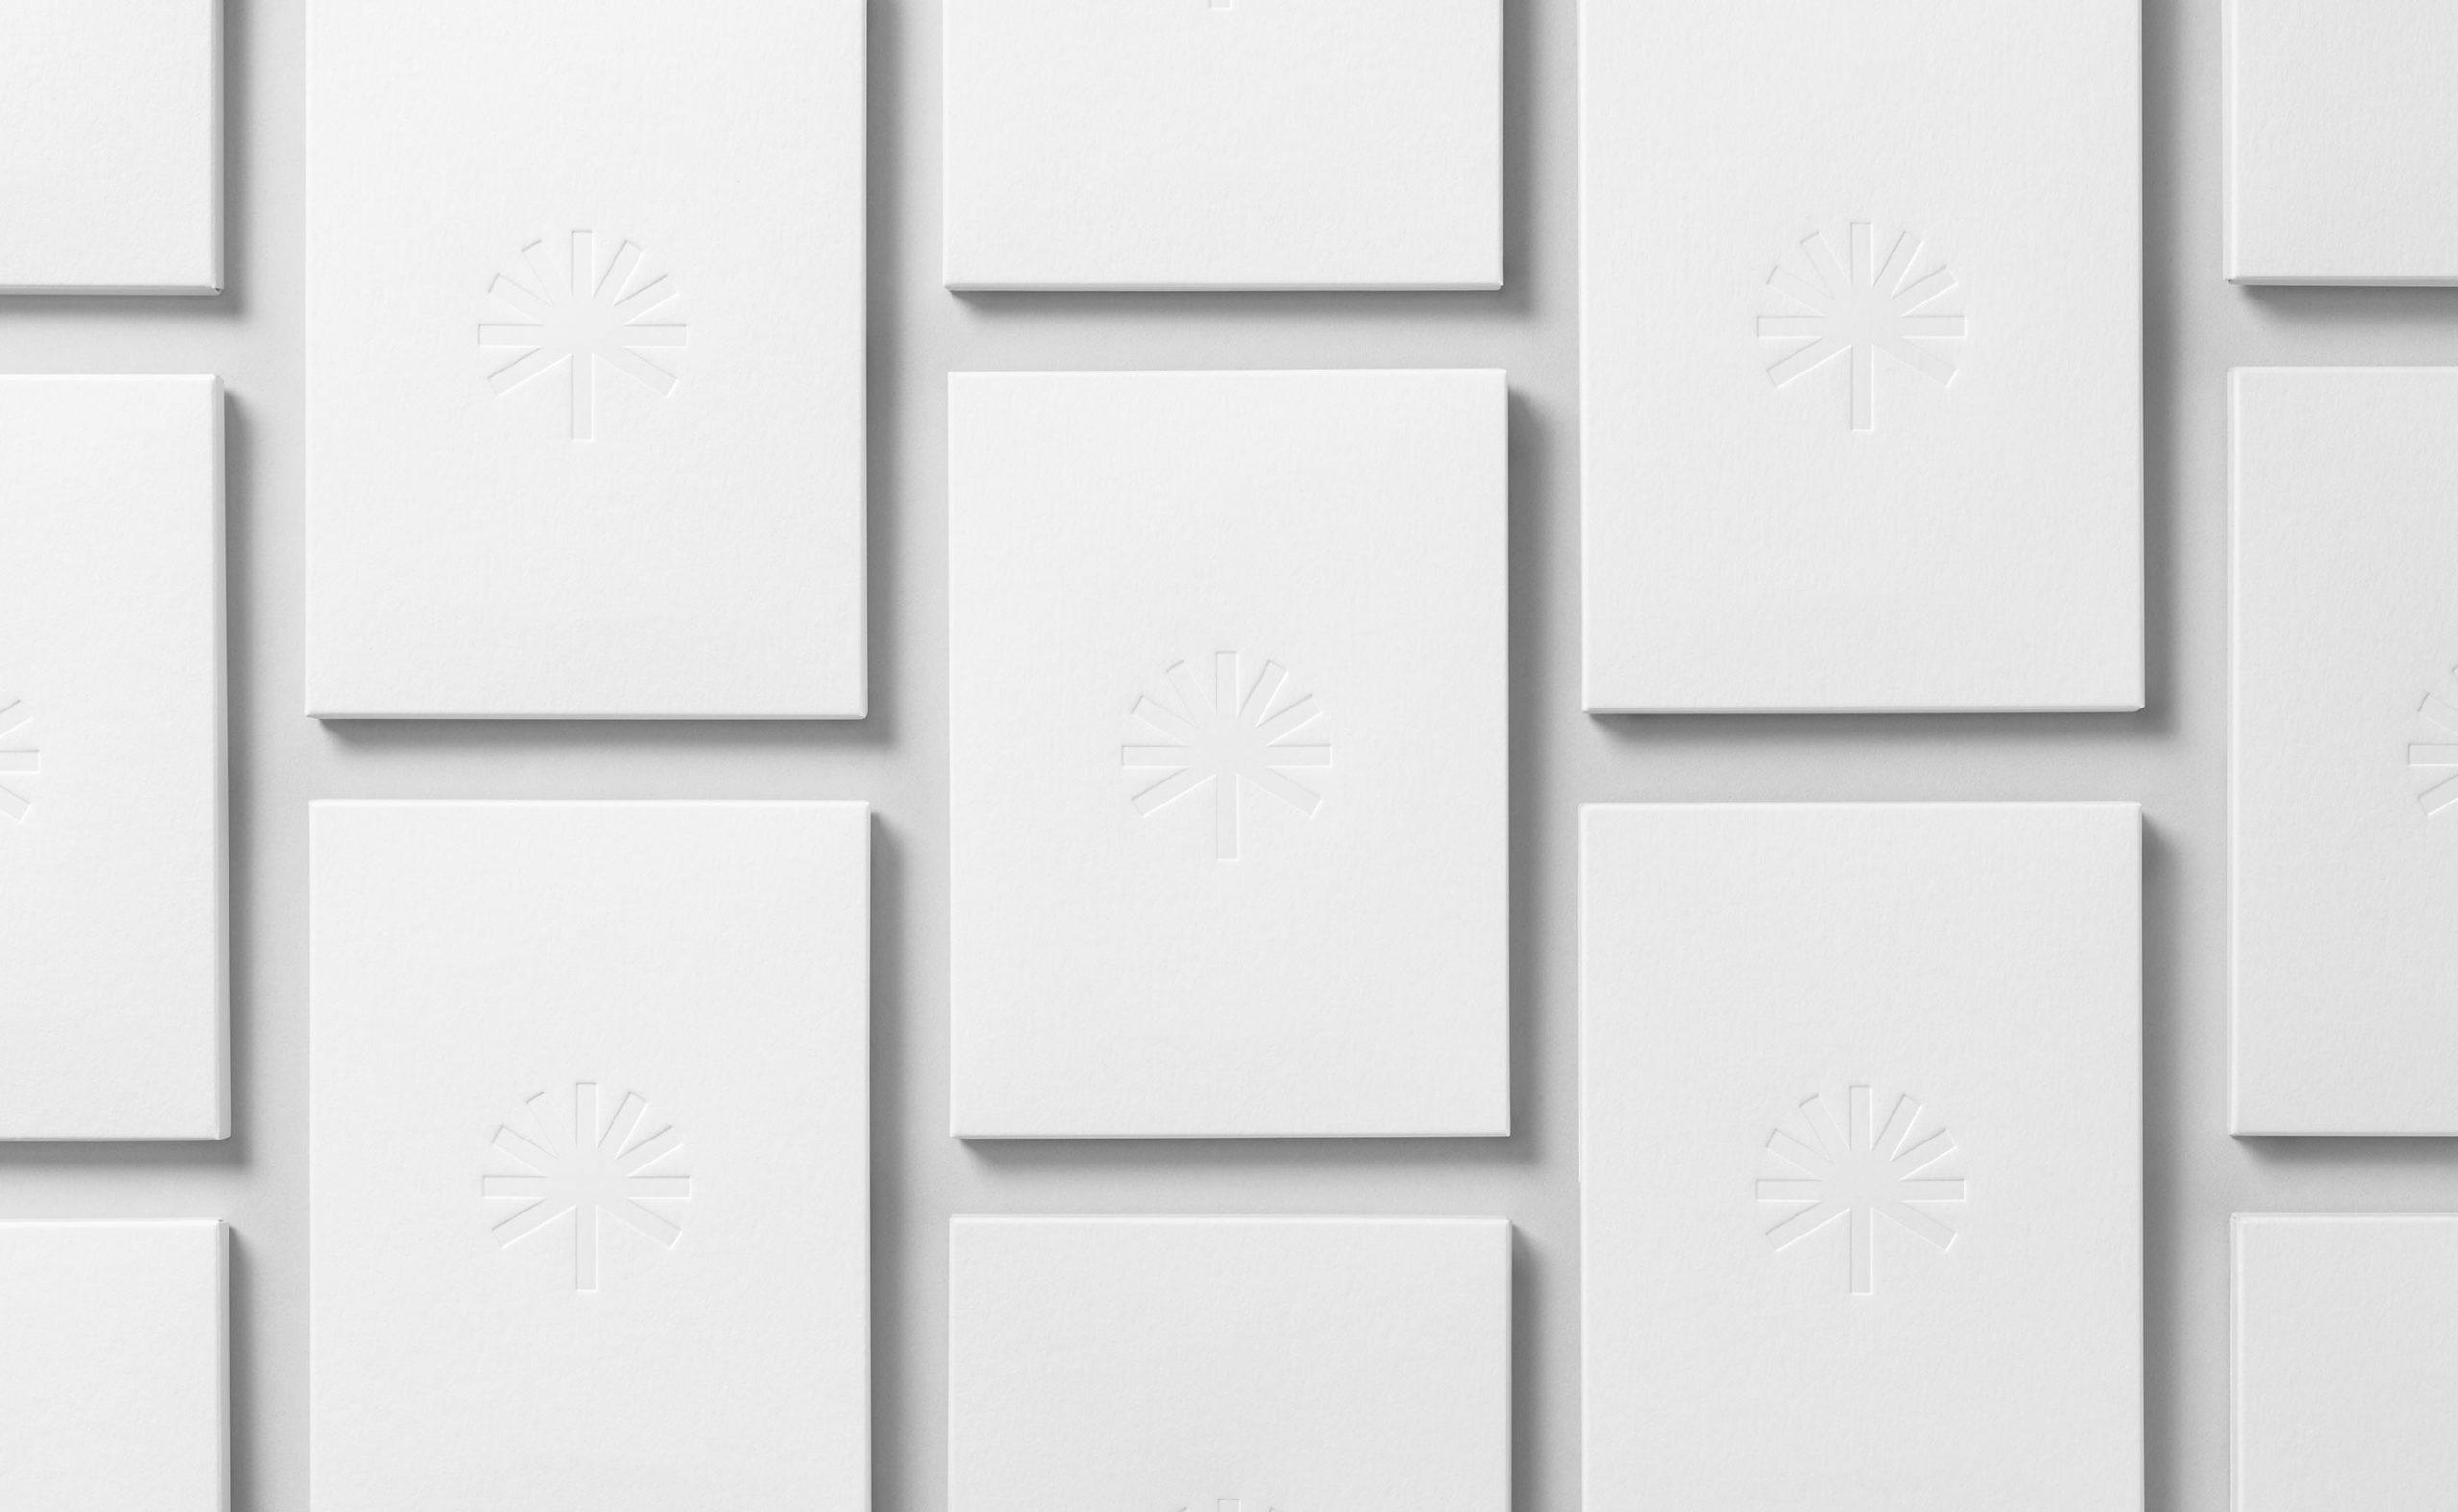 bpf_cardset-grid_2730x1680